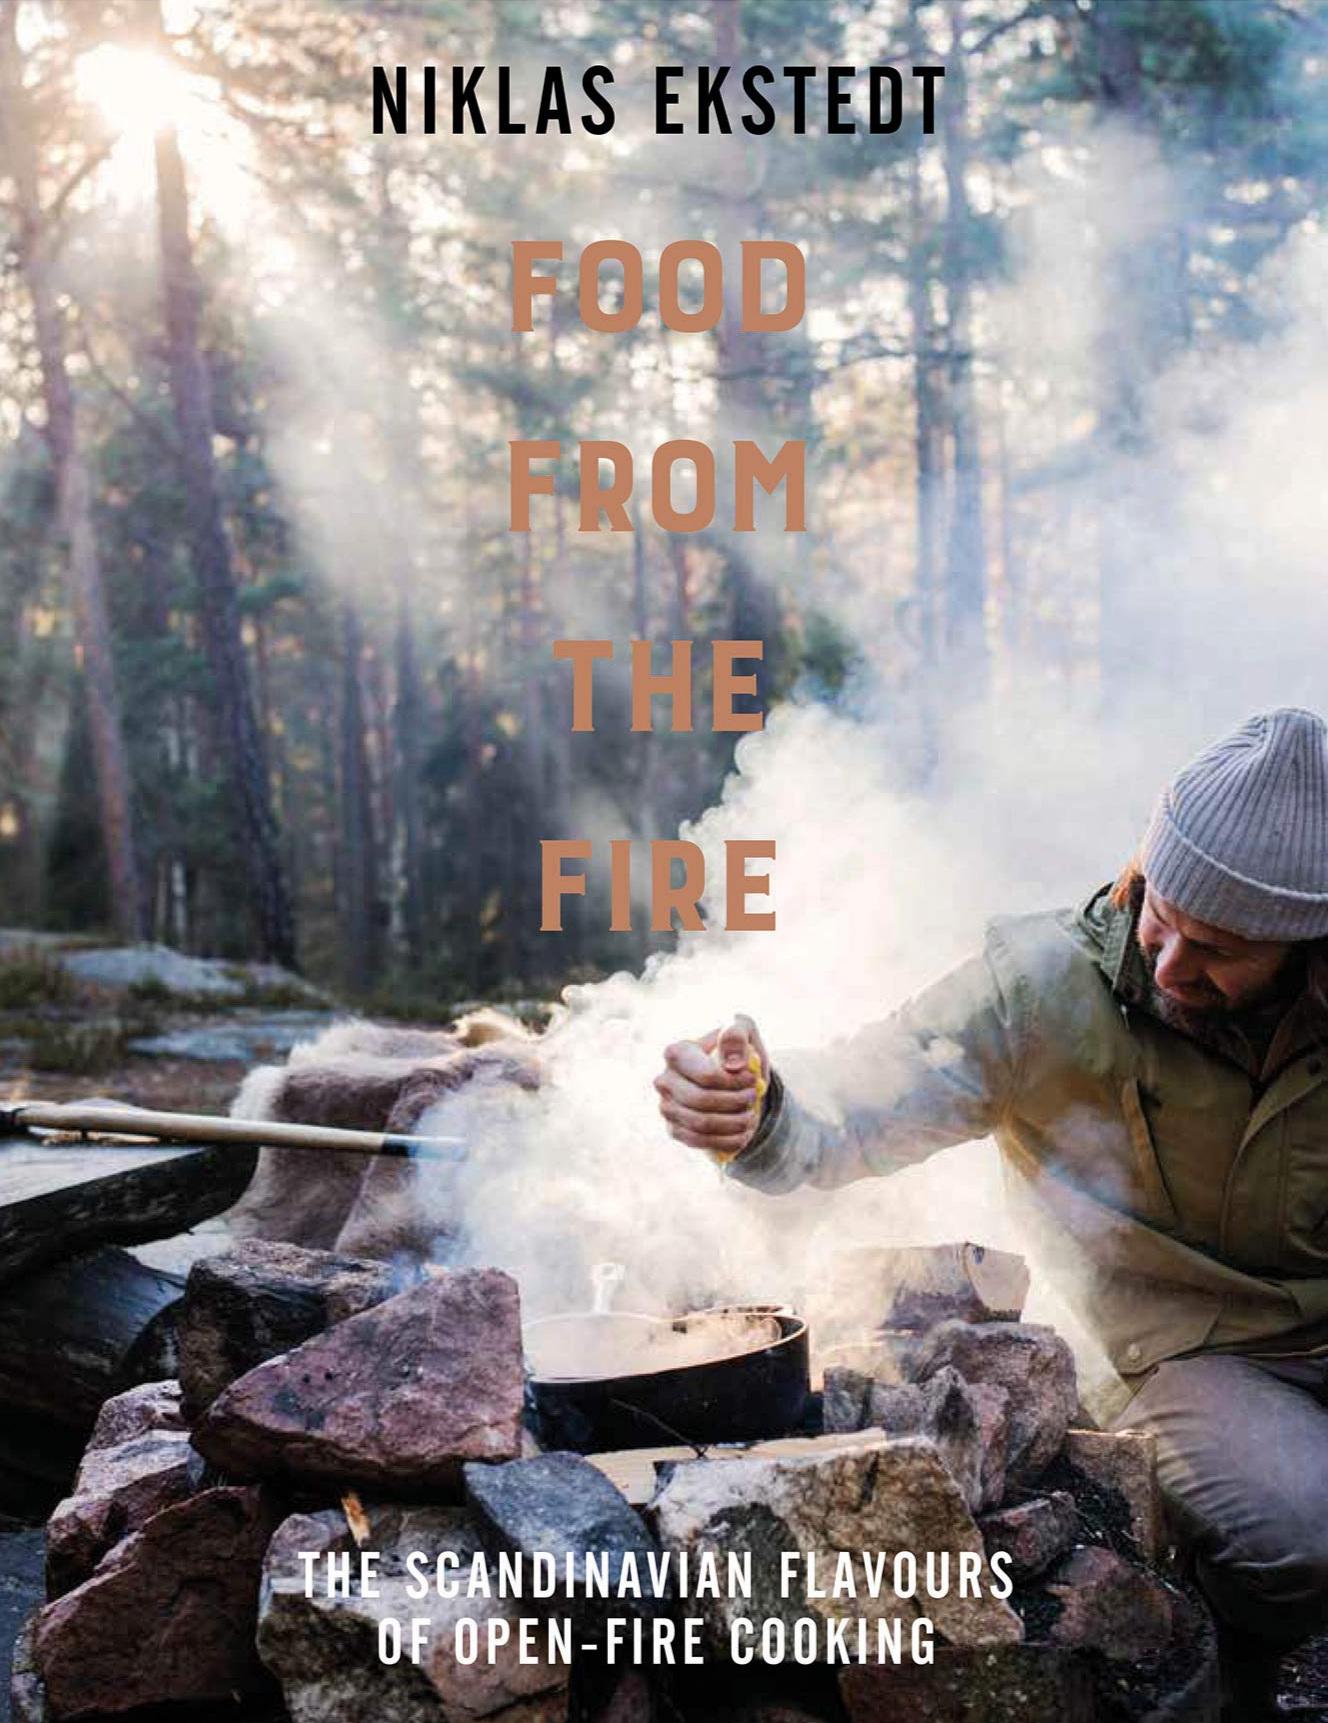 foodfromthefire.jpg